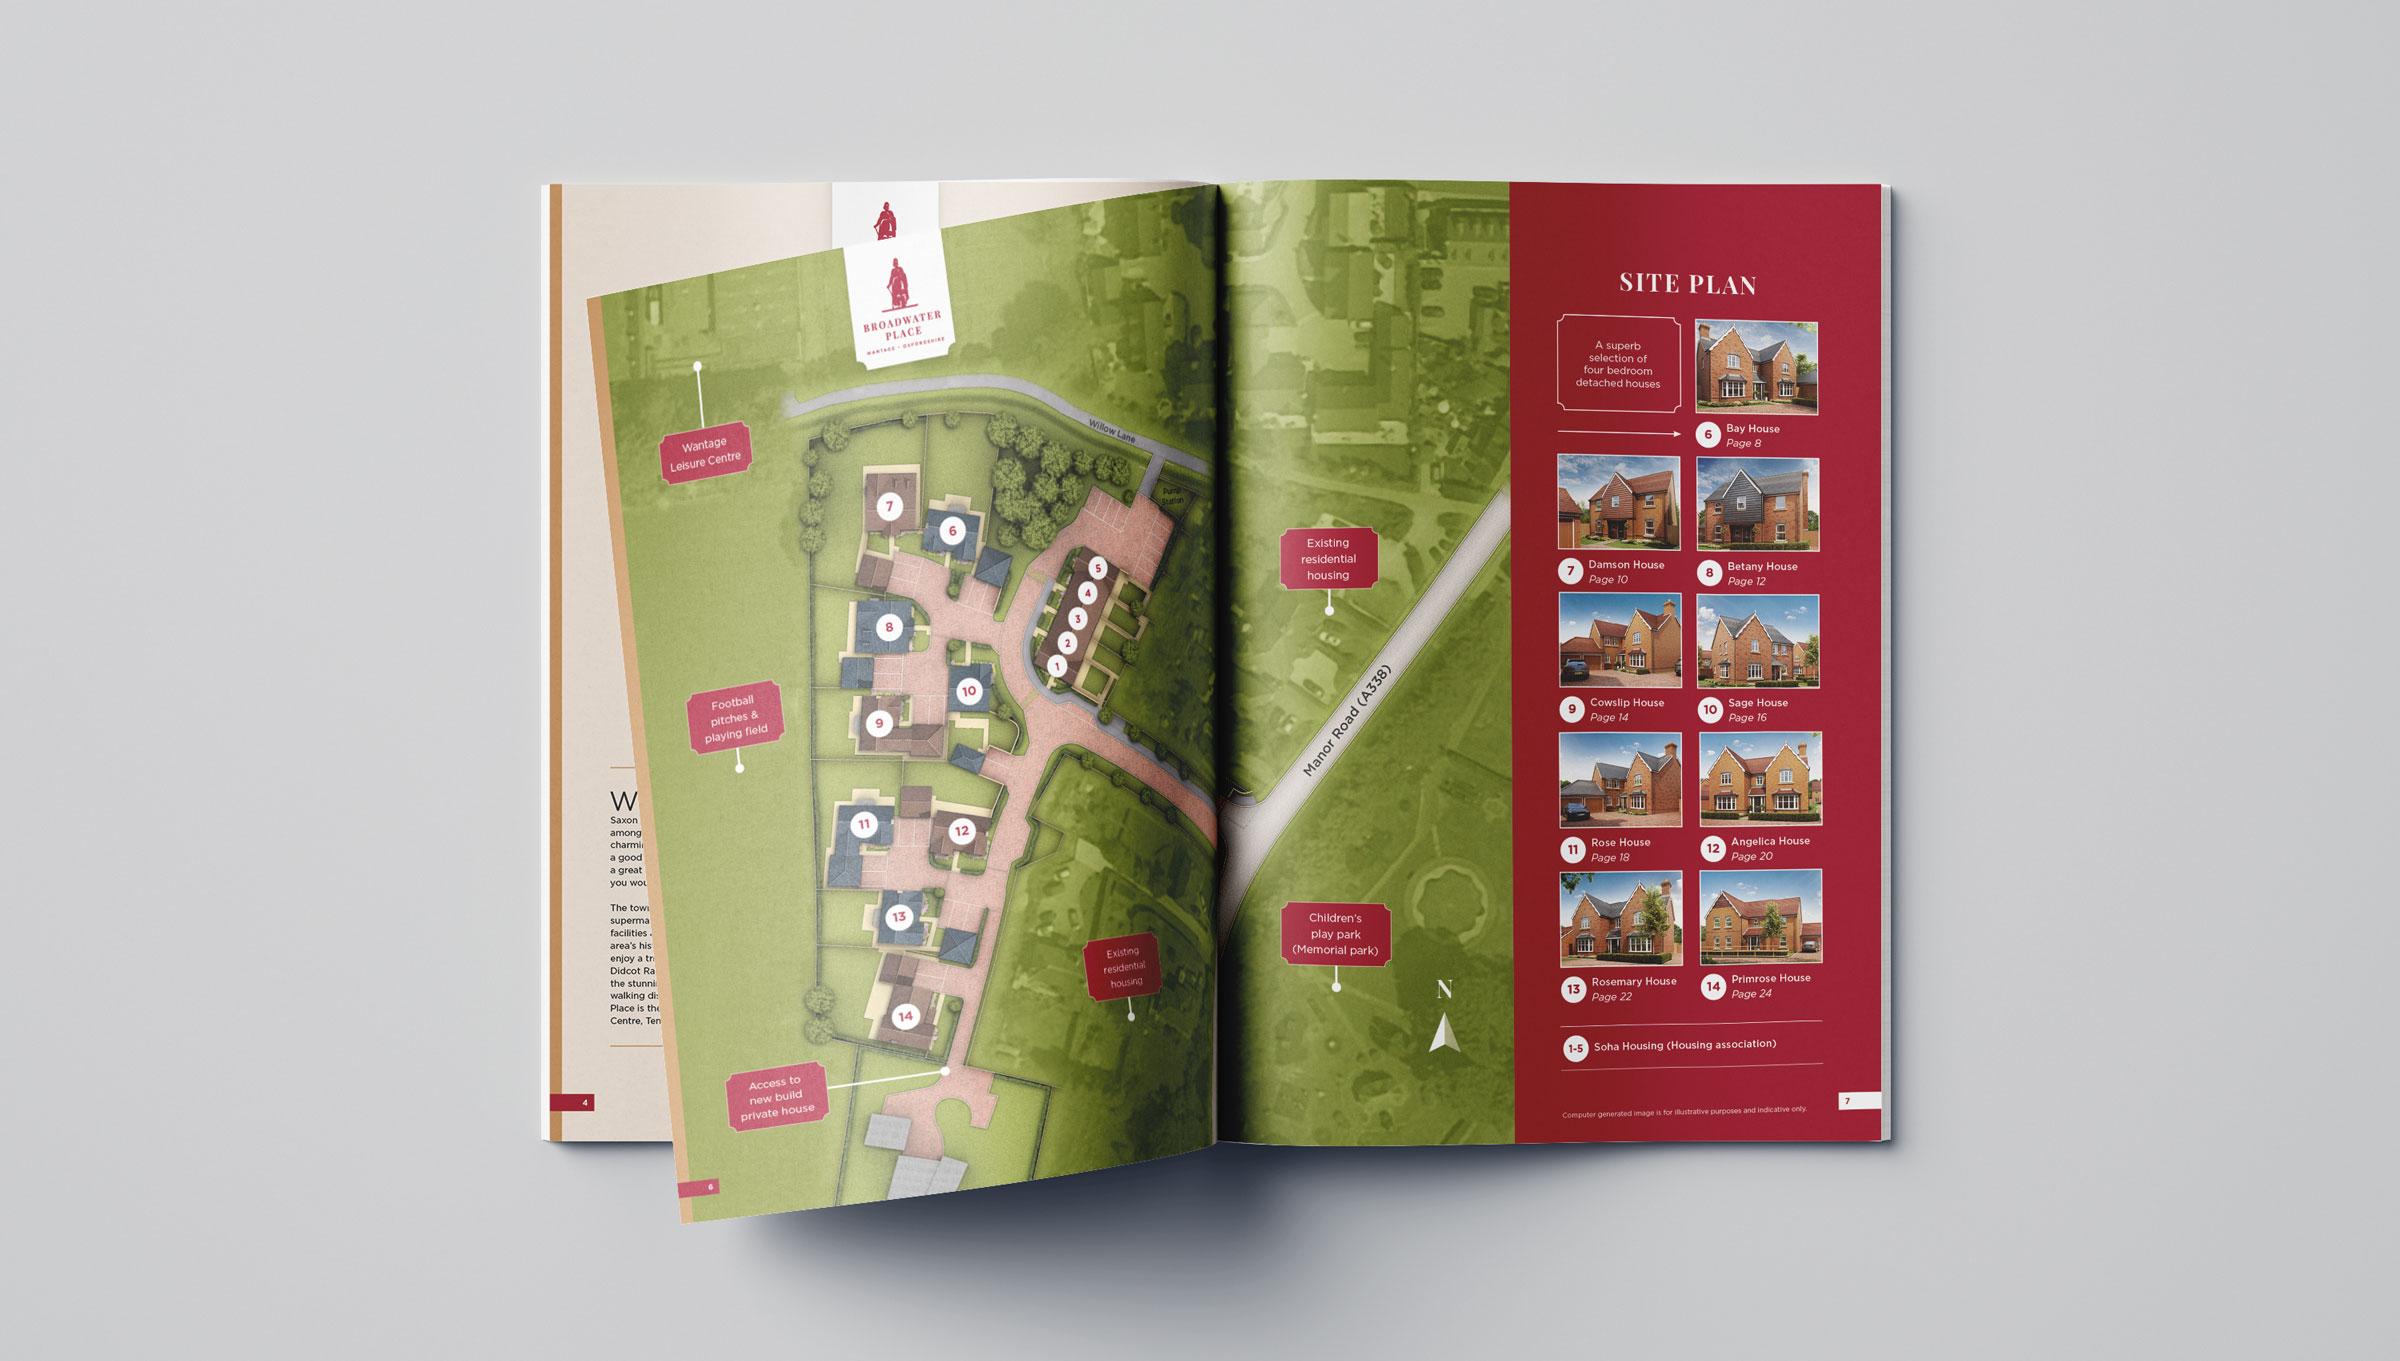 Broadwater_Place_siteplan_spread.jpg